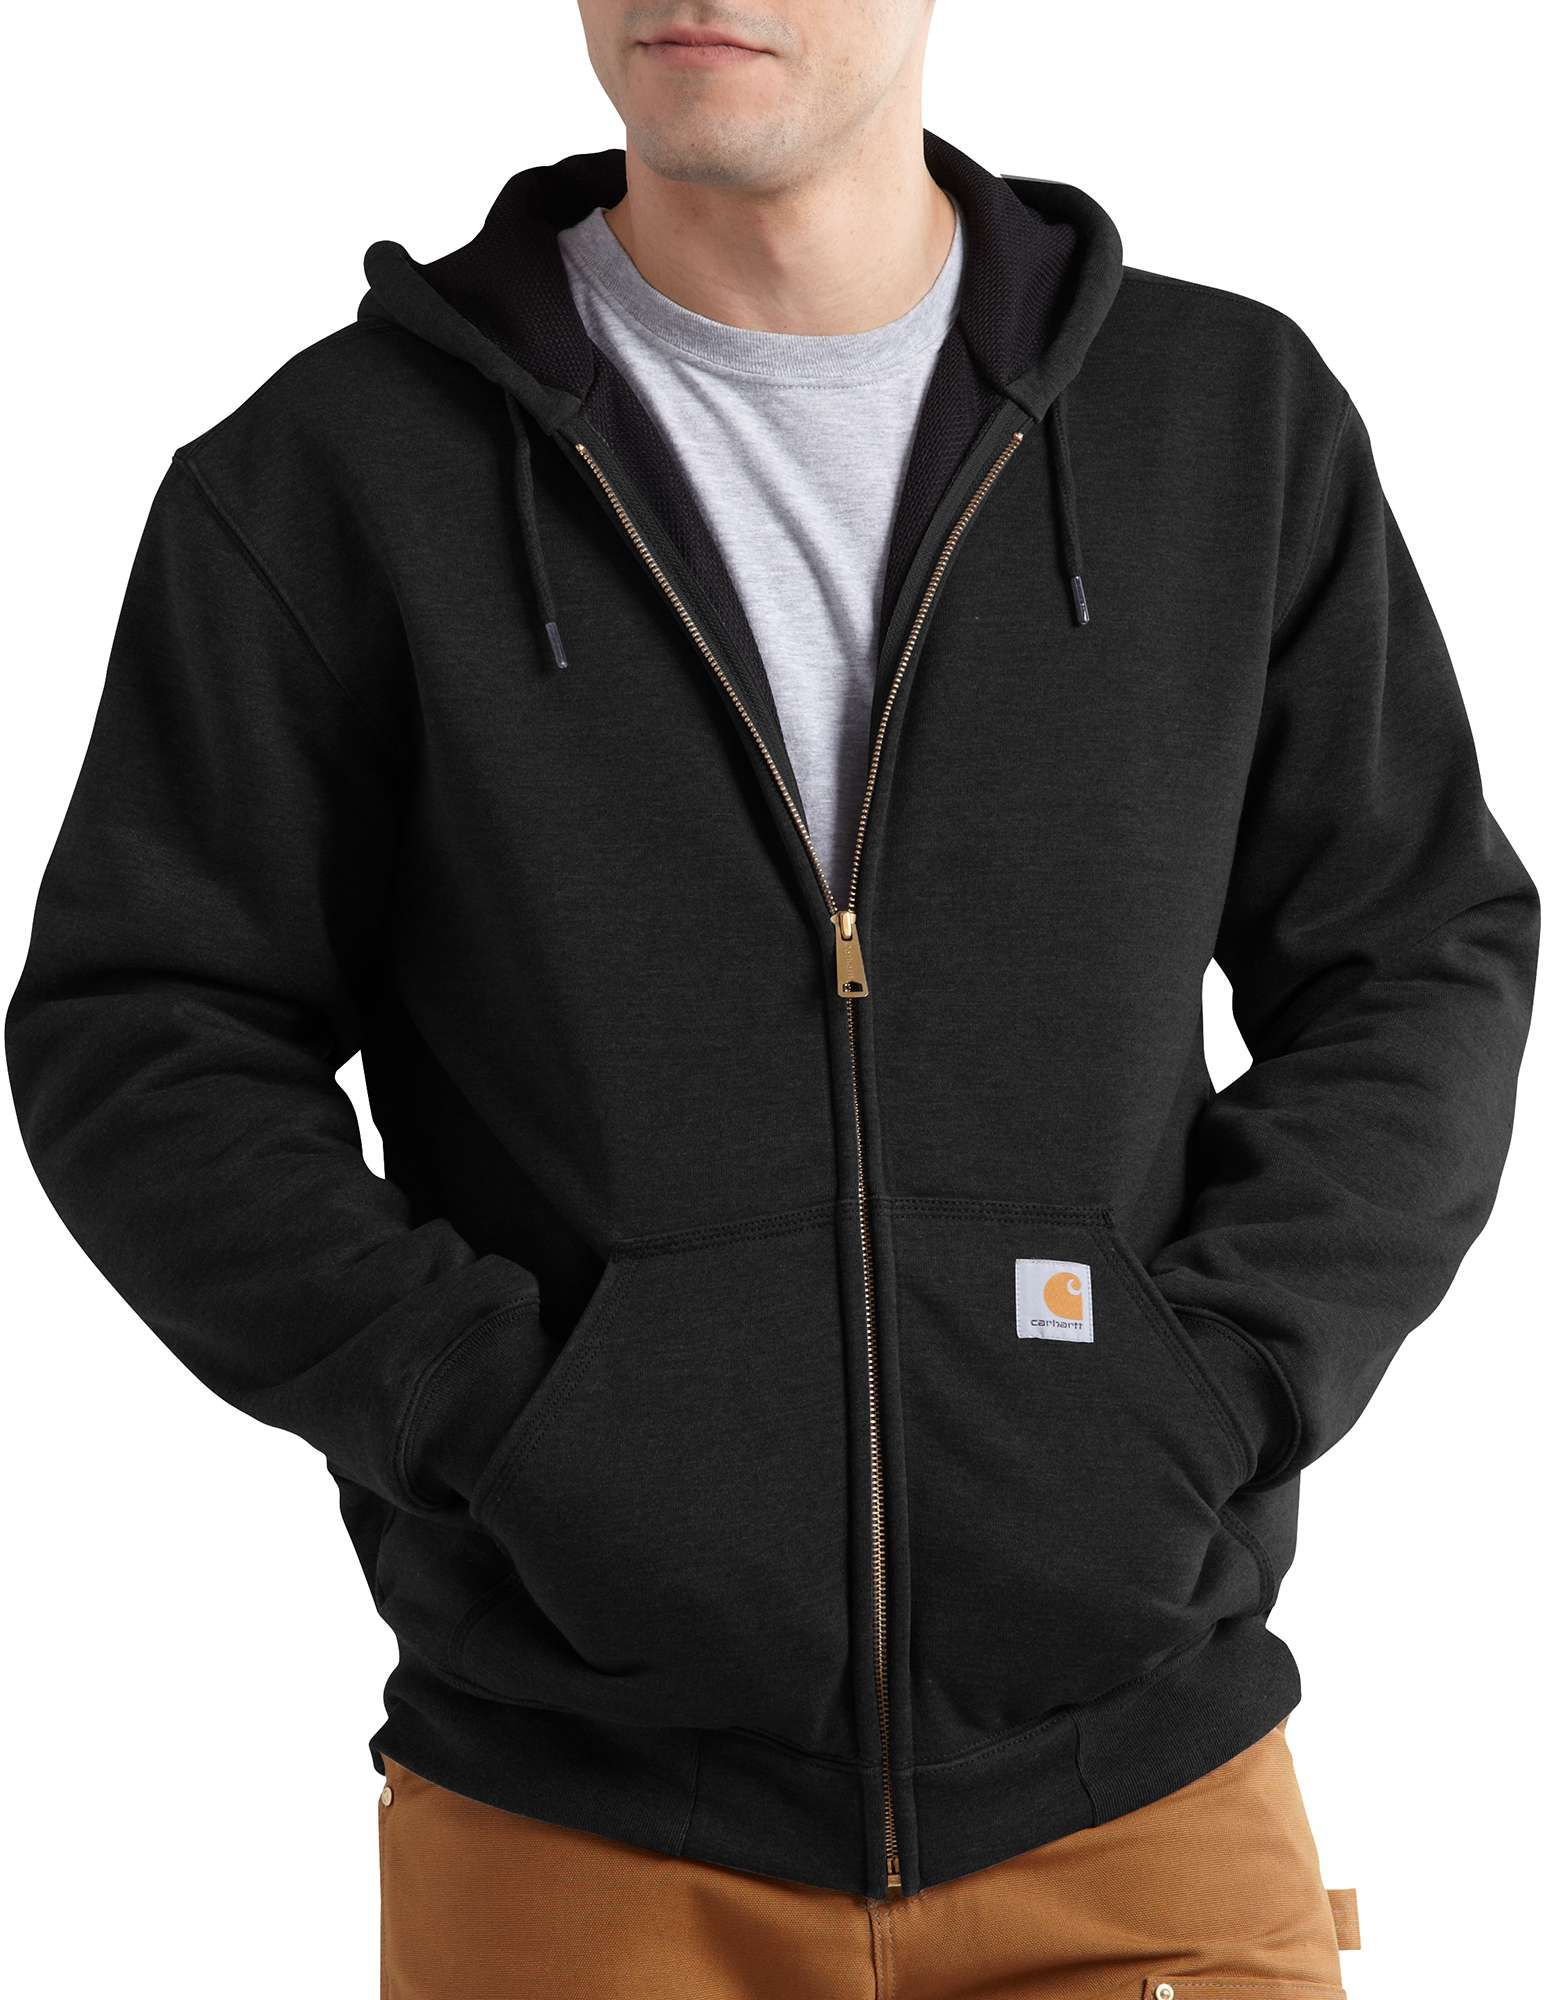 Carhartt Men's Rutland Thermal Lined Hoodie, Size: Small, Black thumbnail